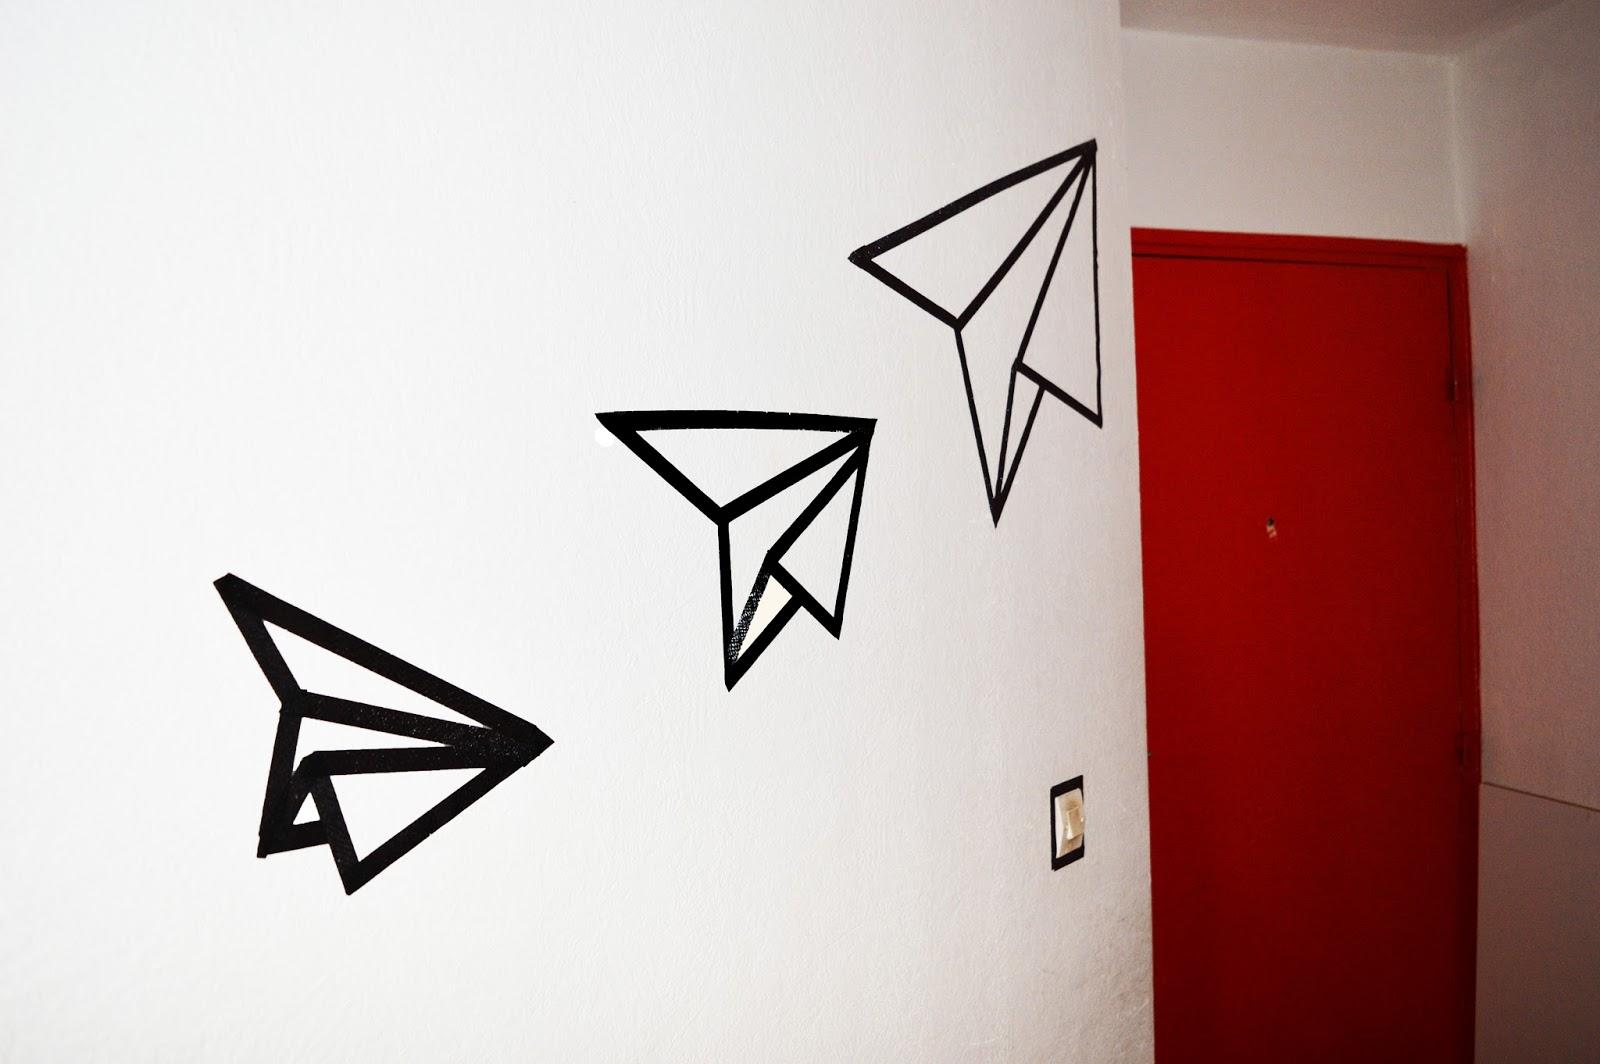 D co murale mini prix 10 diy en masking tape aly 39 s for Decoration murale art deco